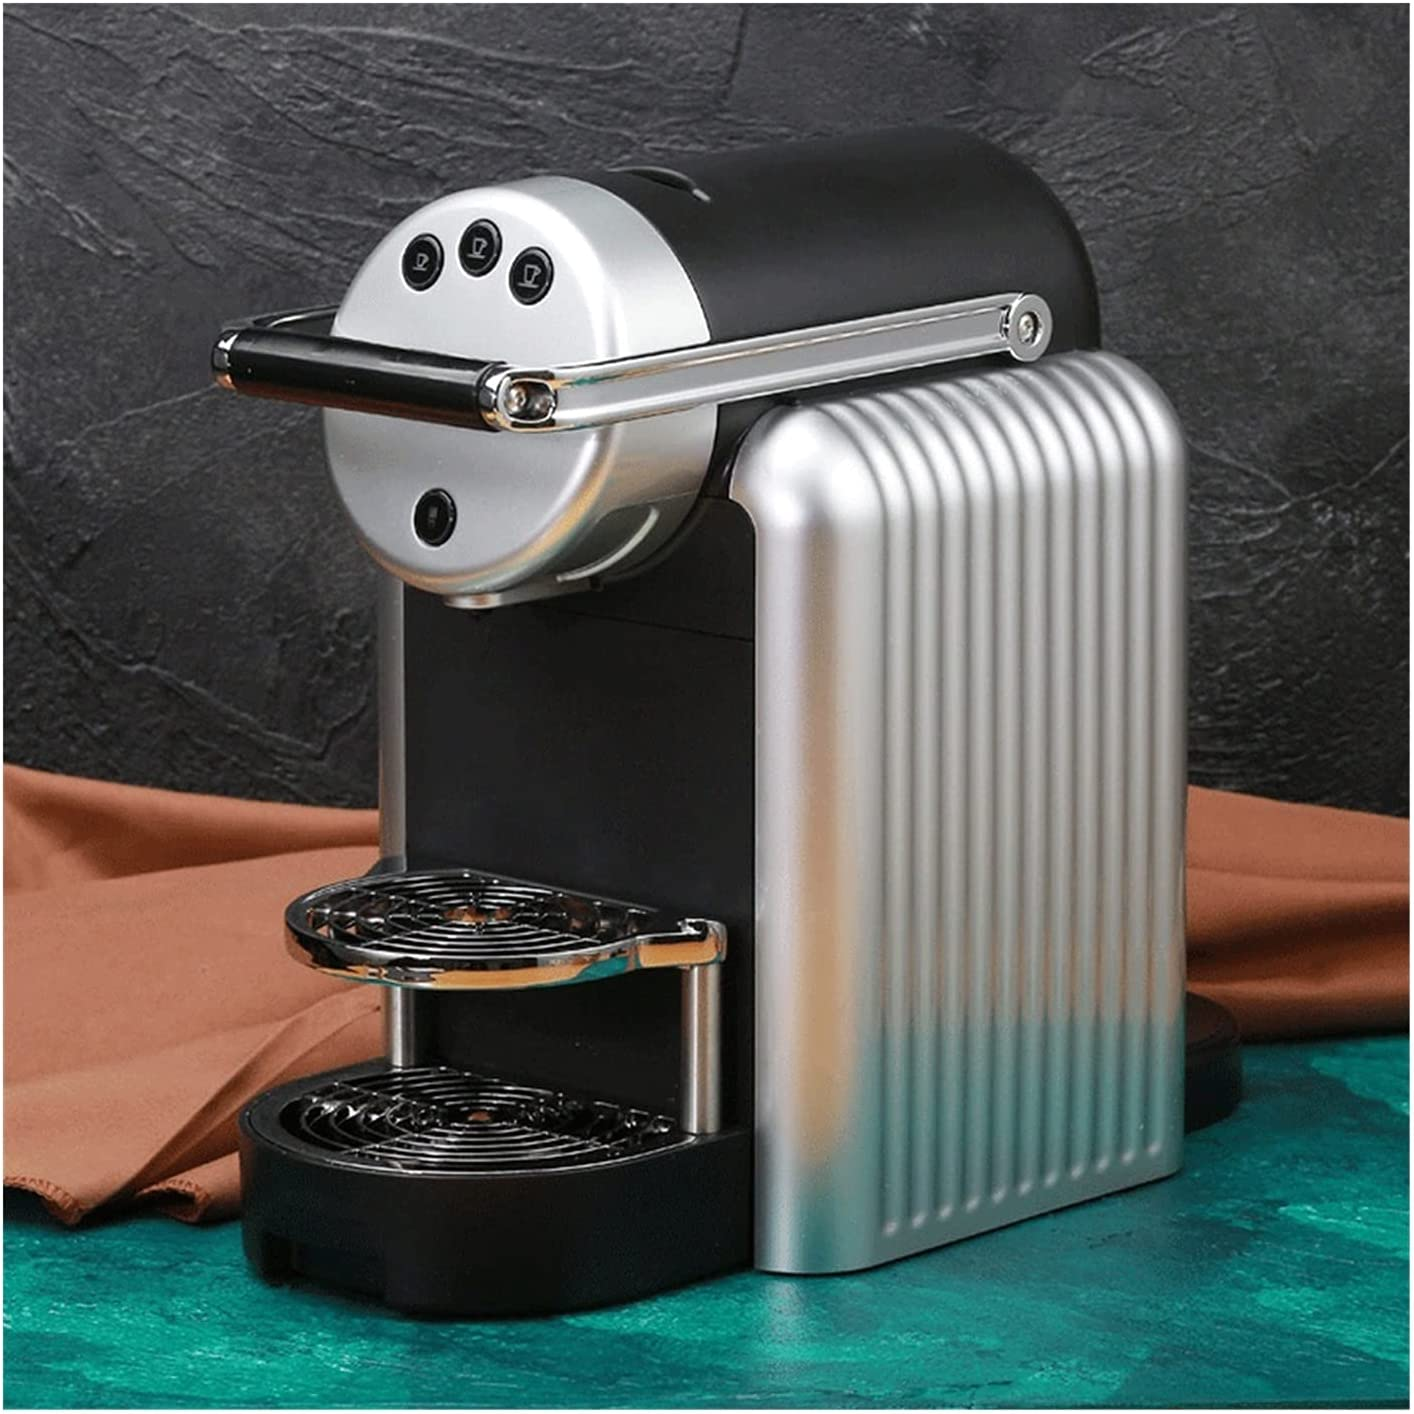 MERSHAO Espresso 100% quality warranty Machine 1650W High 2.3 unisex Removable L Performance